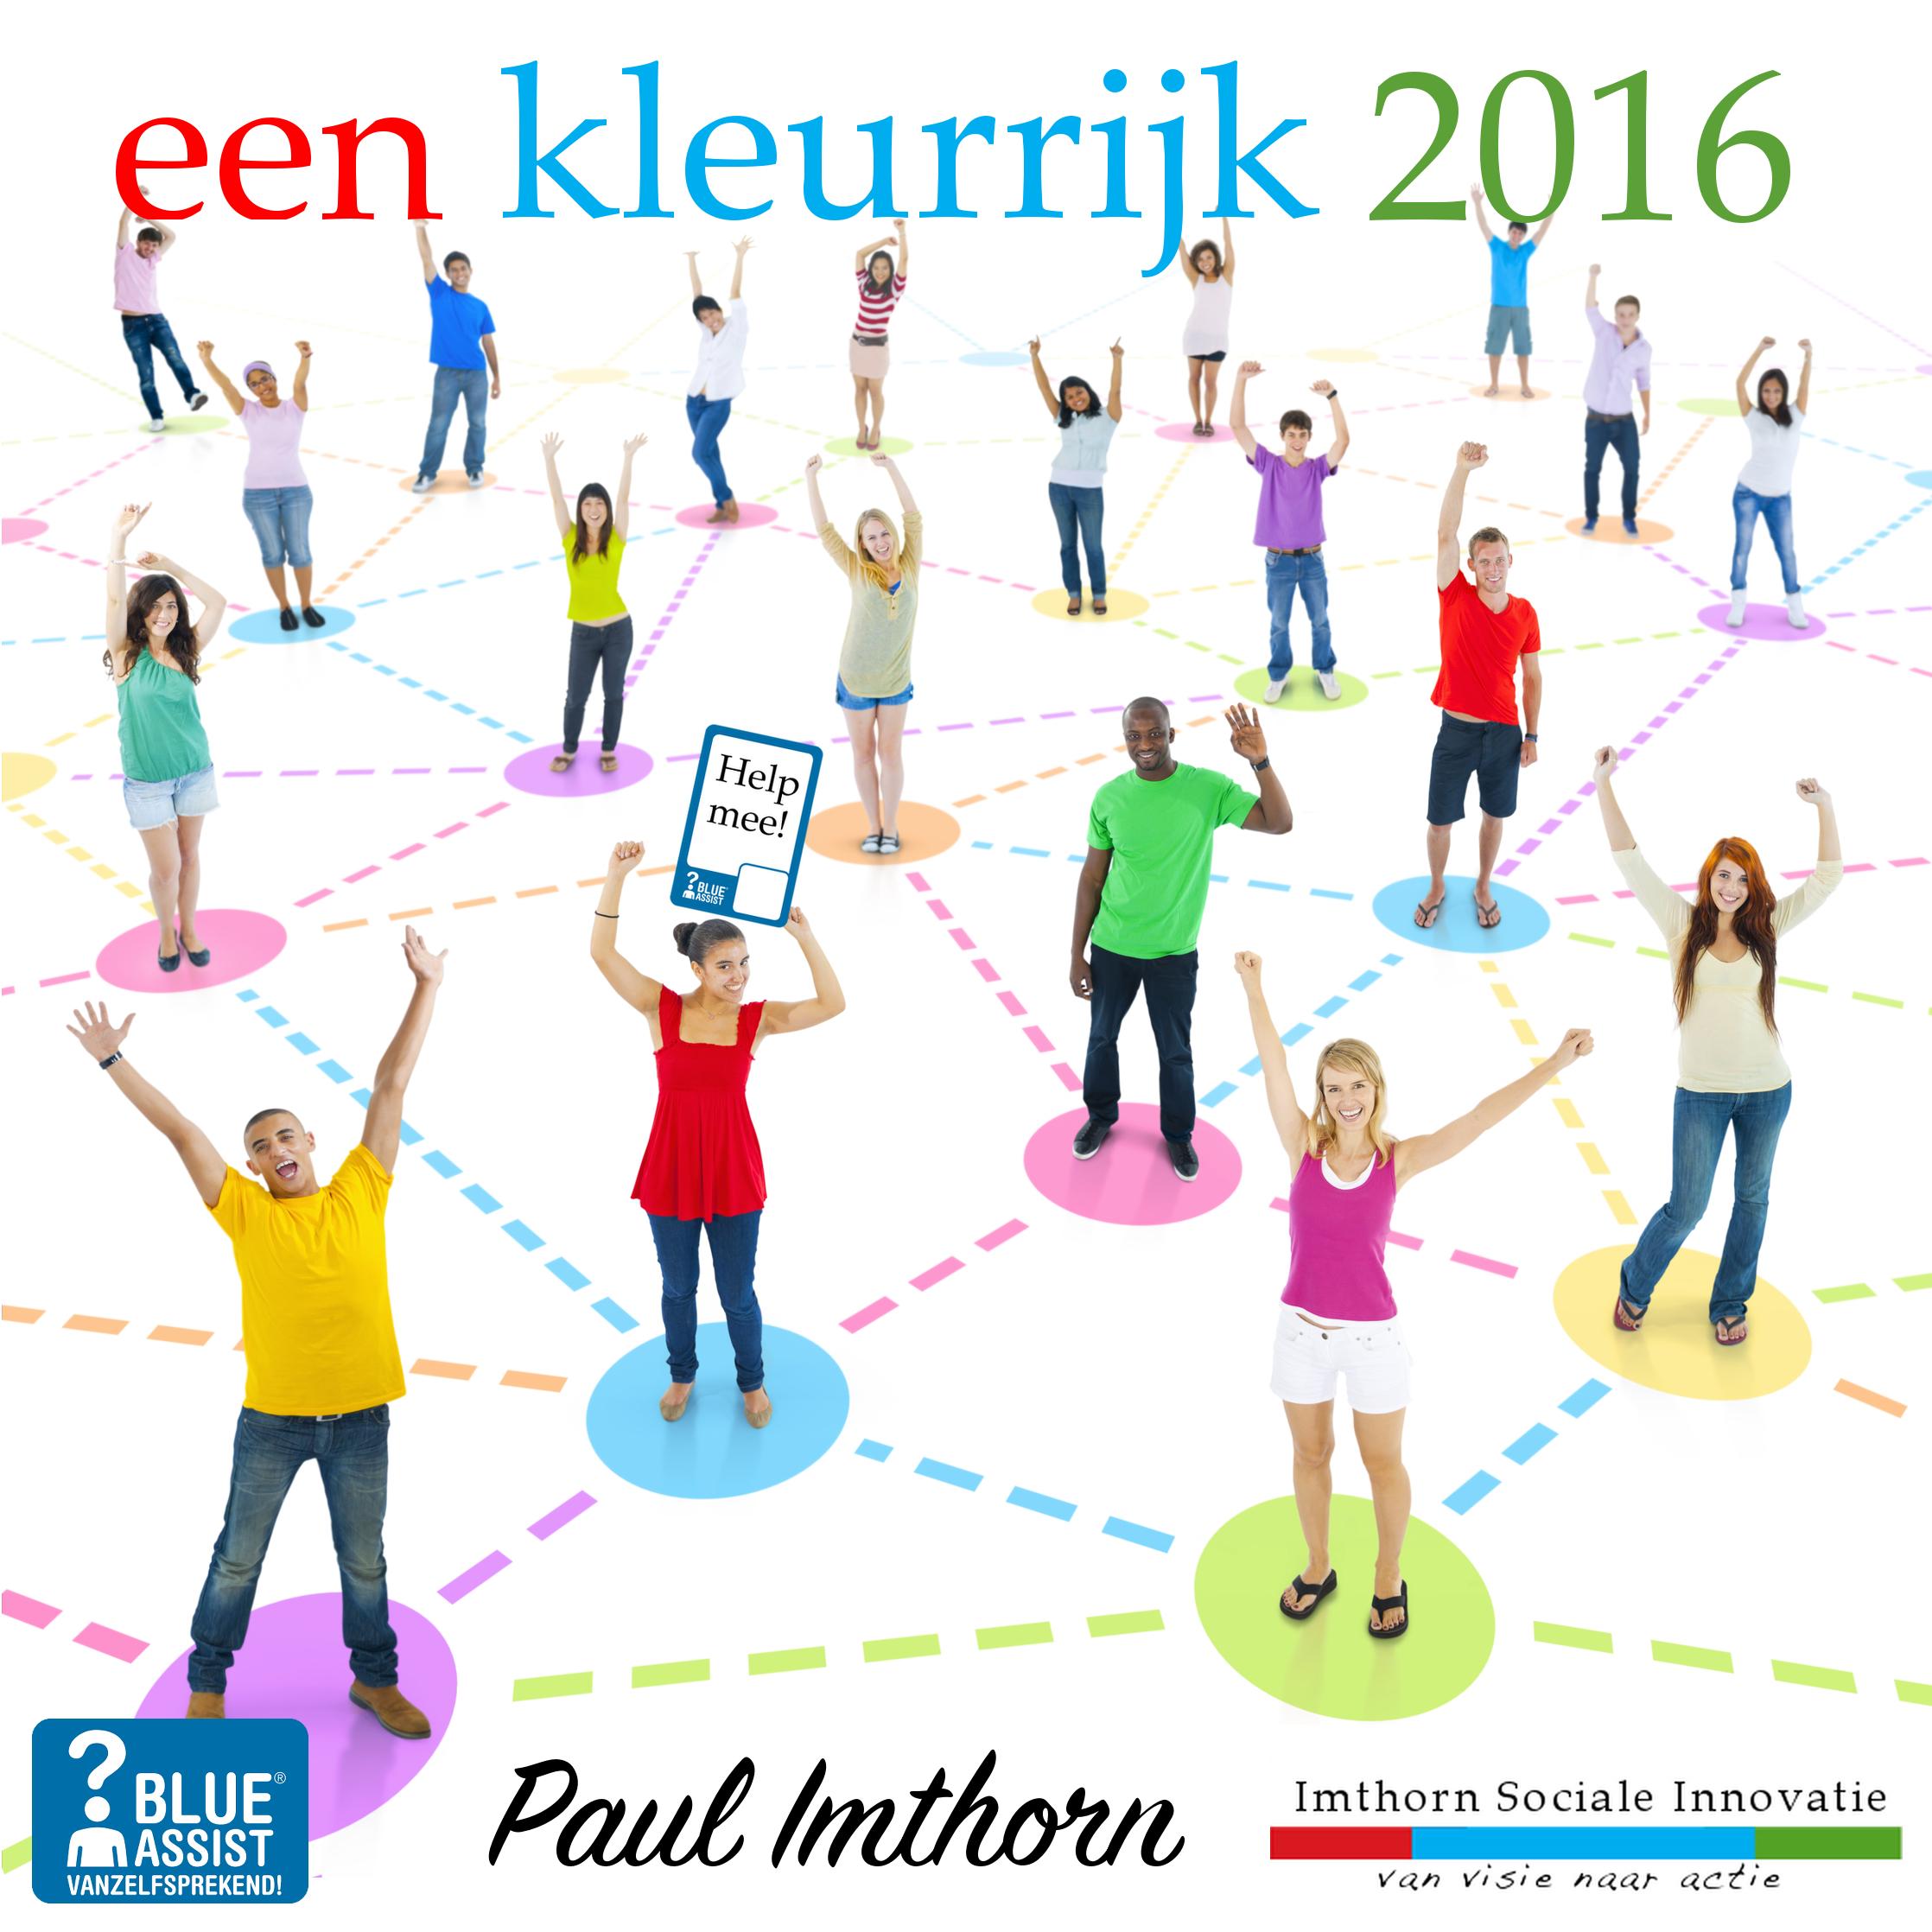 wenskaart 2016 Imthorn Sociale Innovatie